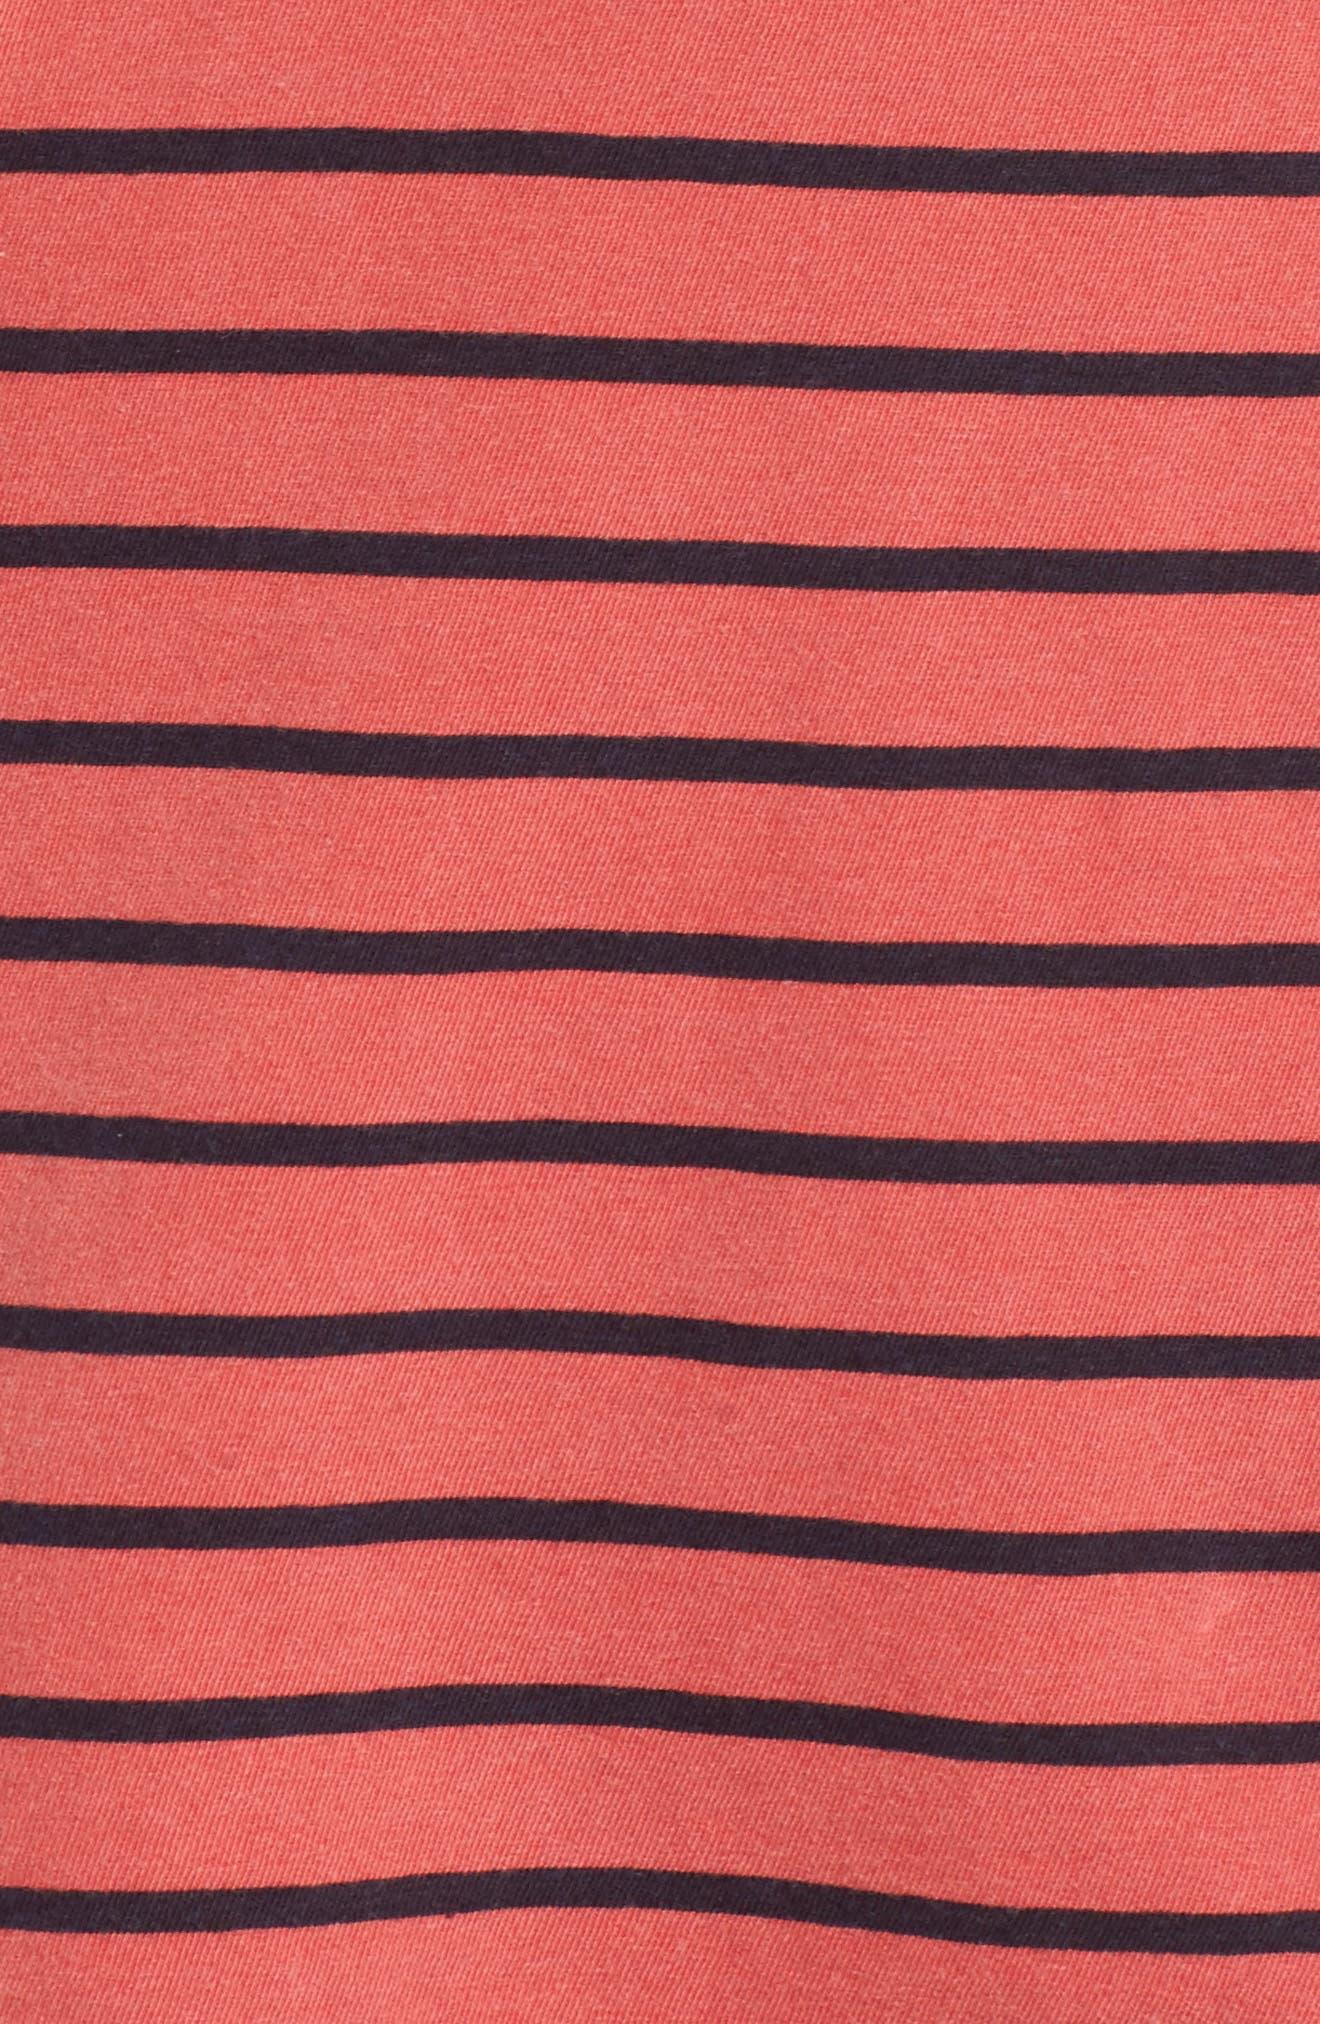 Stripe Button Tee,                             Alternate thumbnail 5, color,                             Chili